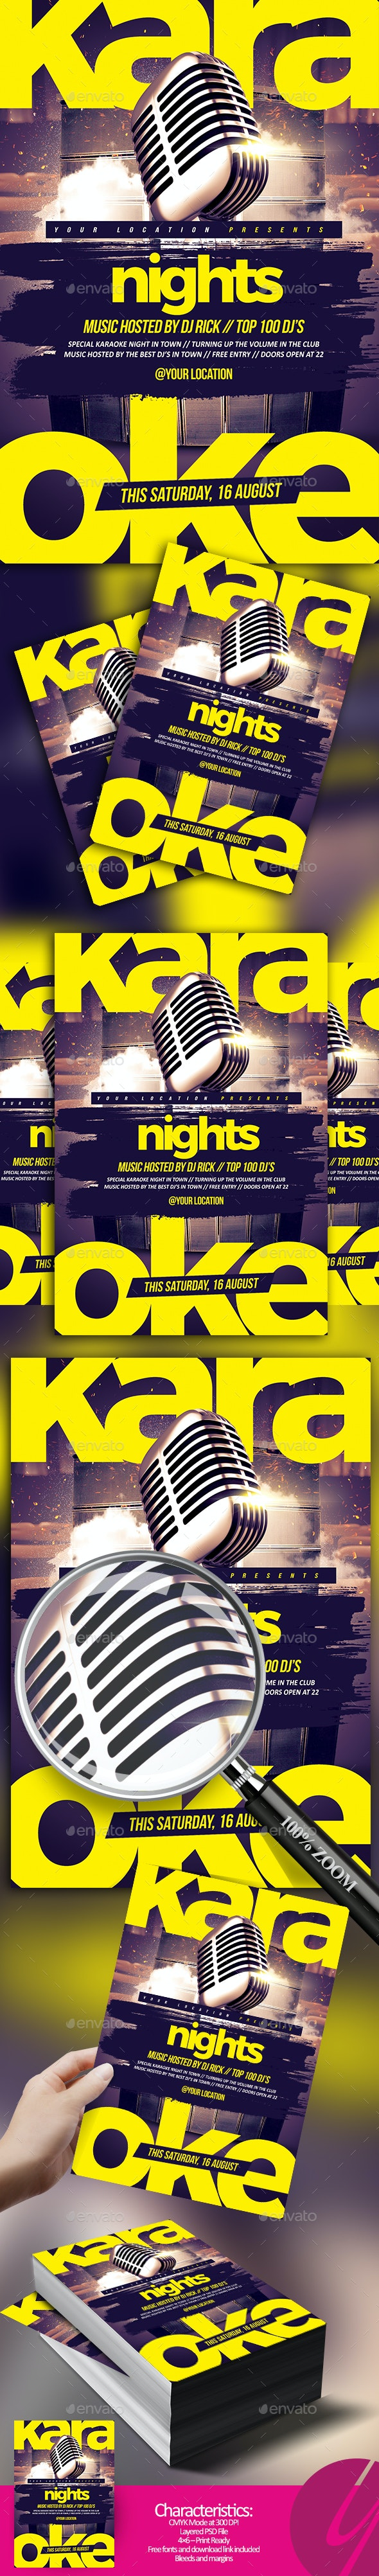 Karaoke Nights Flyer - Clubs & Parties Events